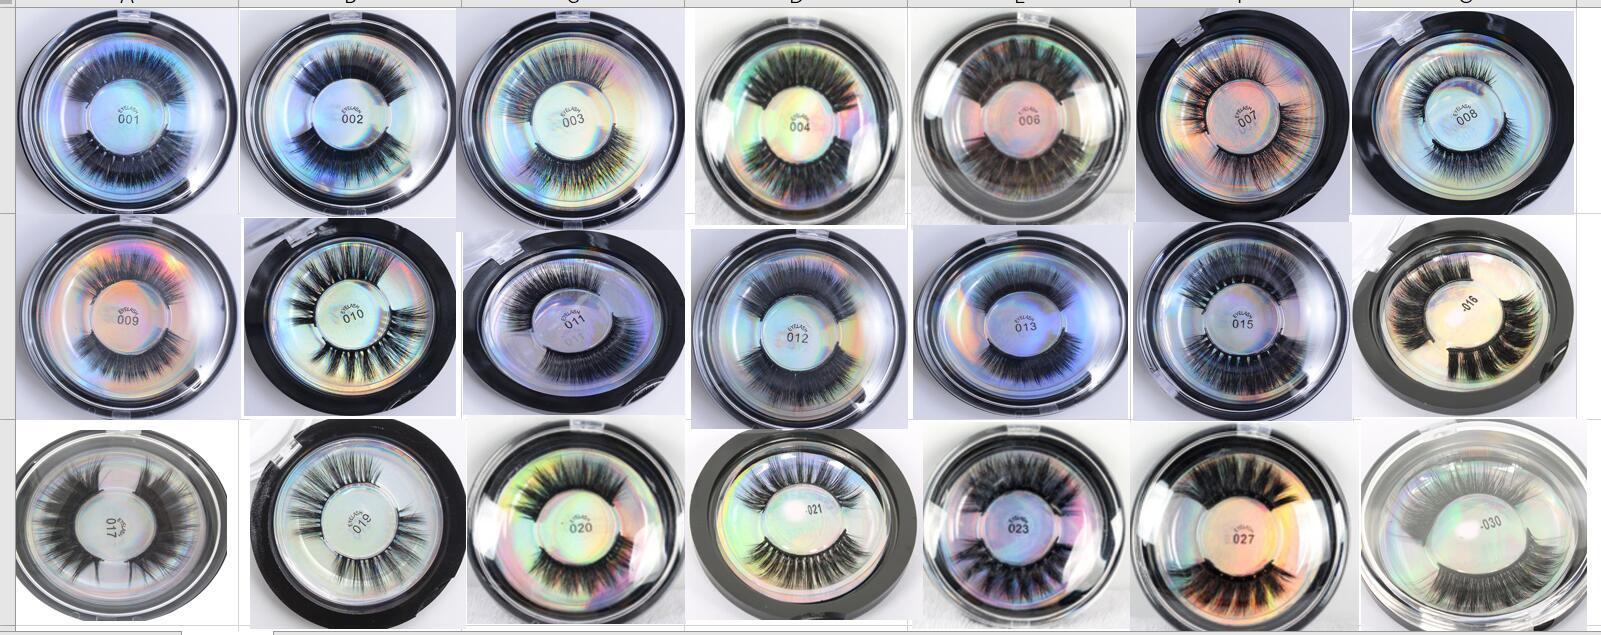 Mink Lashes 3D Silk Protein Mink False Eyelashes Soft Natural Thick Fake Eyelashes Eye Lashes Extension Makeup Lashes